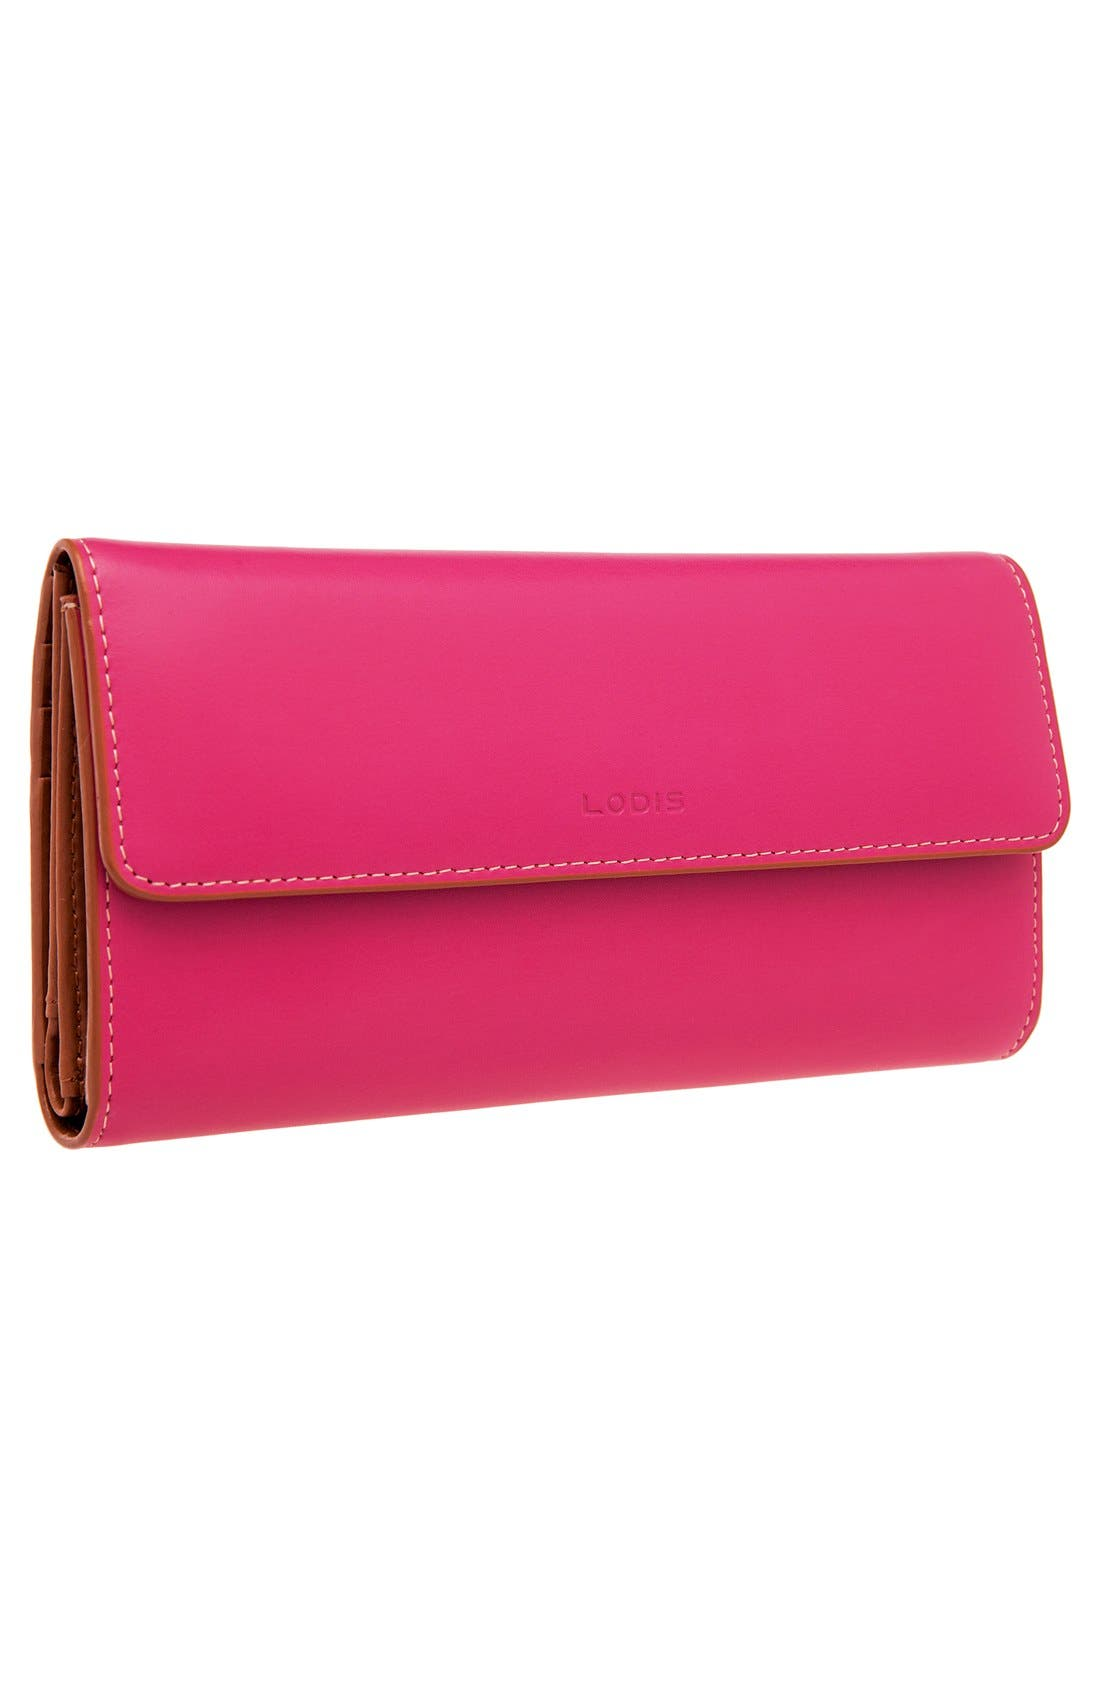 Alternate Image 5  - Lodis 'Audrey' Checkbook Clutch Wallet